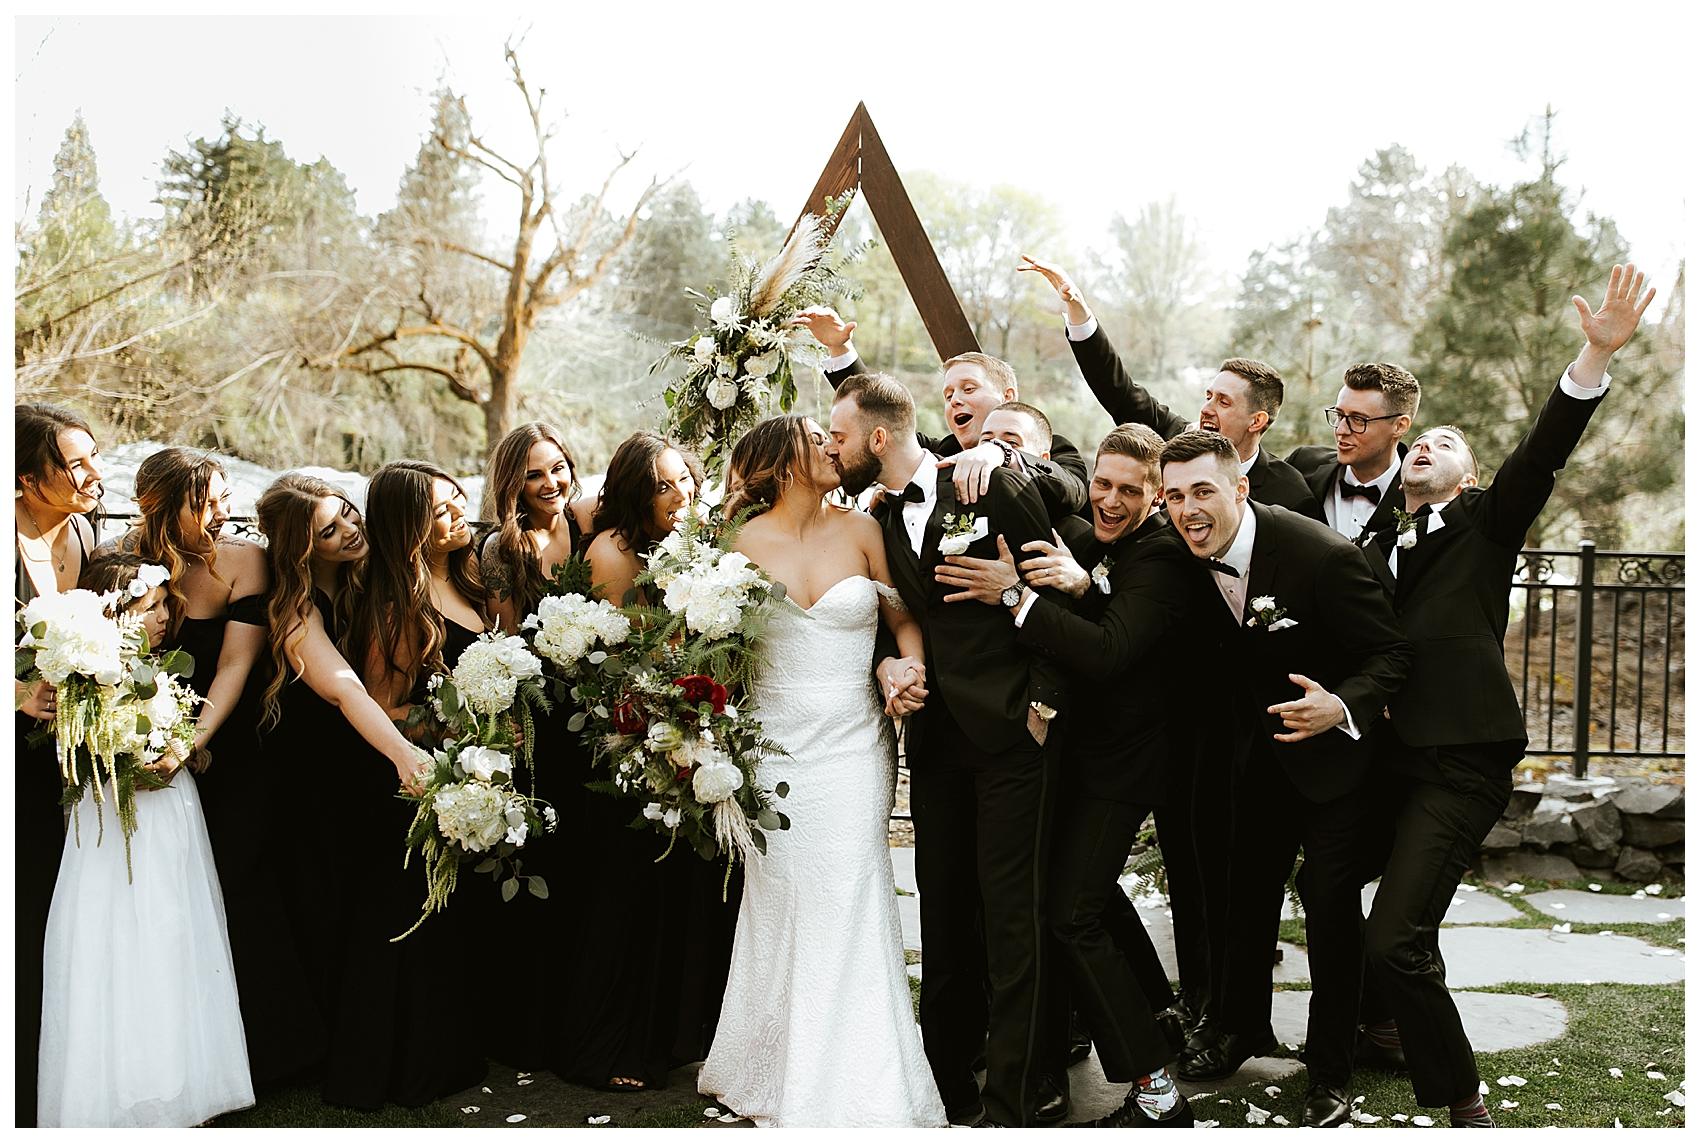 Chateau Rive Spokane Wedding Cassie Trottier Photography01068.jpg